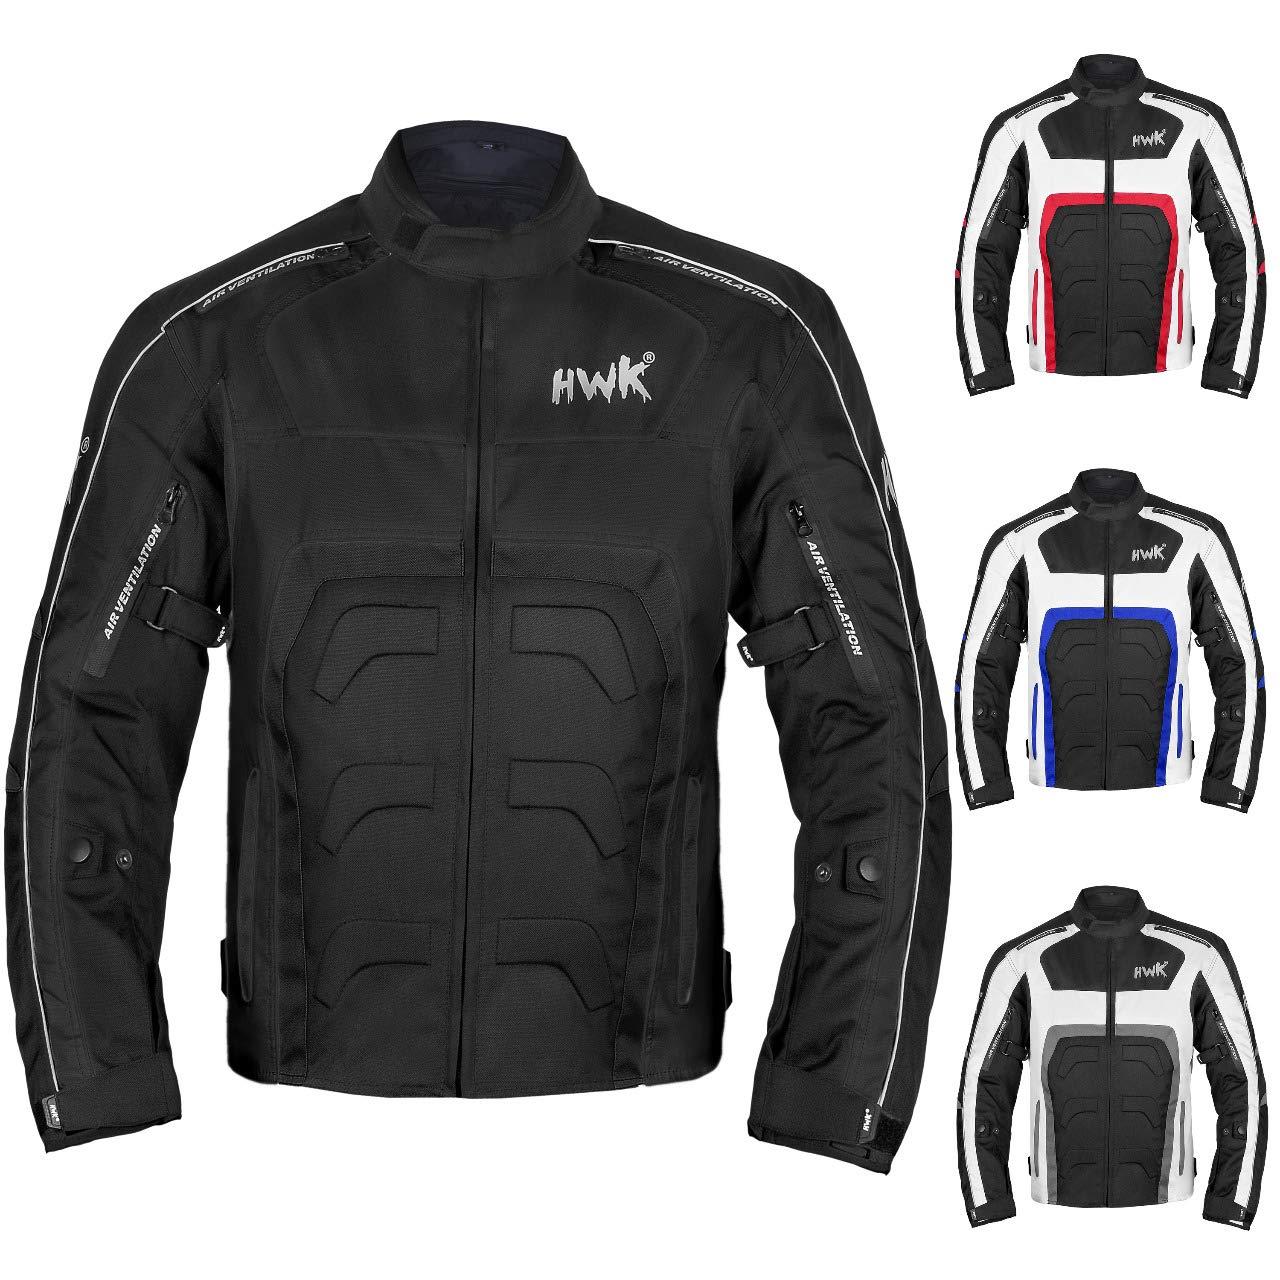 Small, Black HWK Mesh Motorcycle Jacket Riding Air Motorbike Jacket Biker CE Armored Breathable